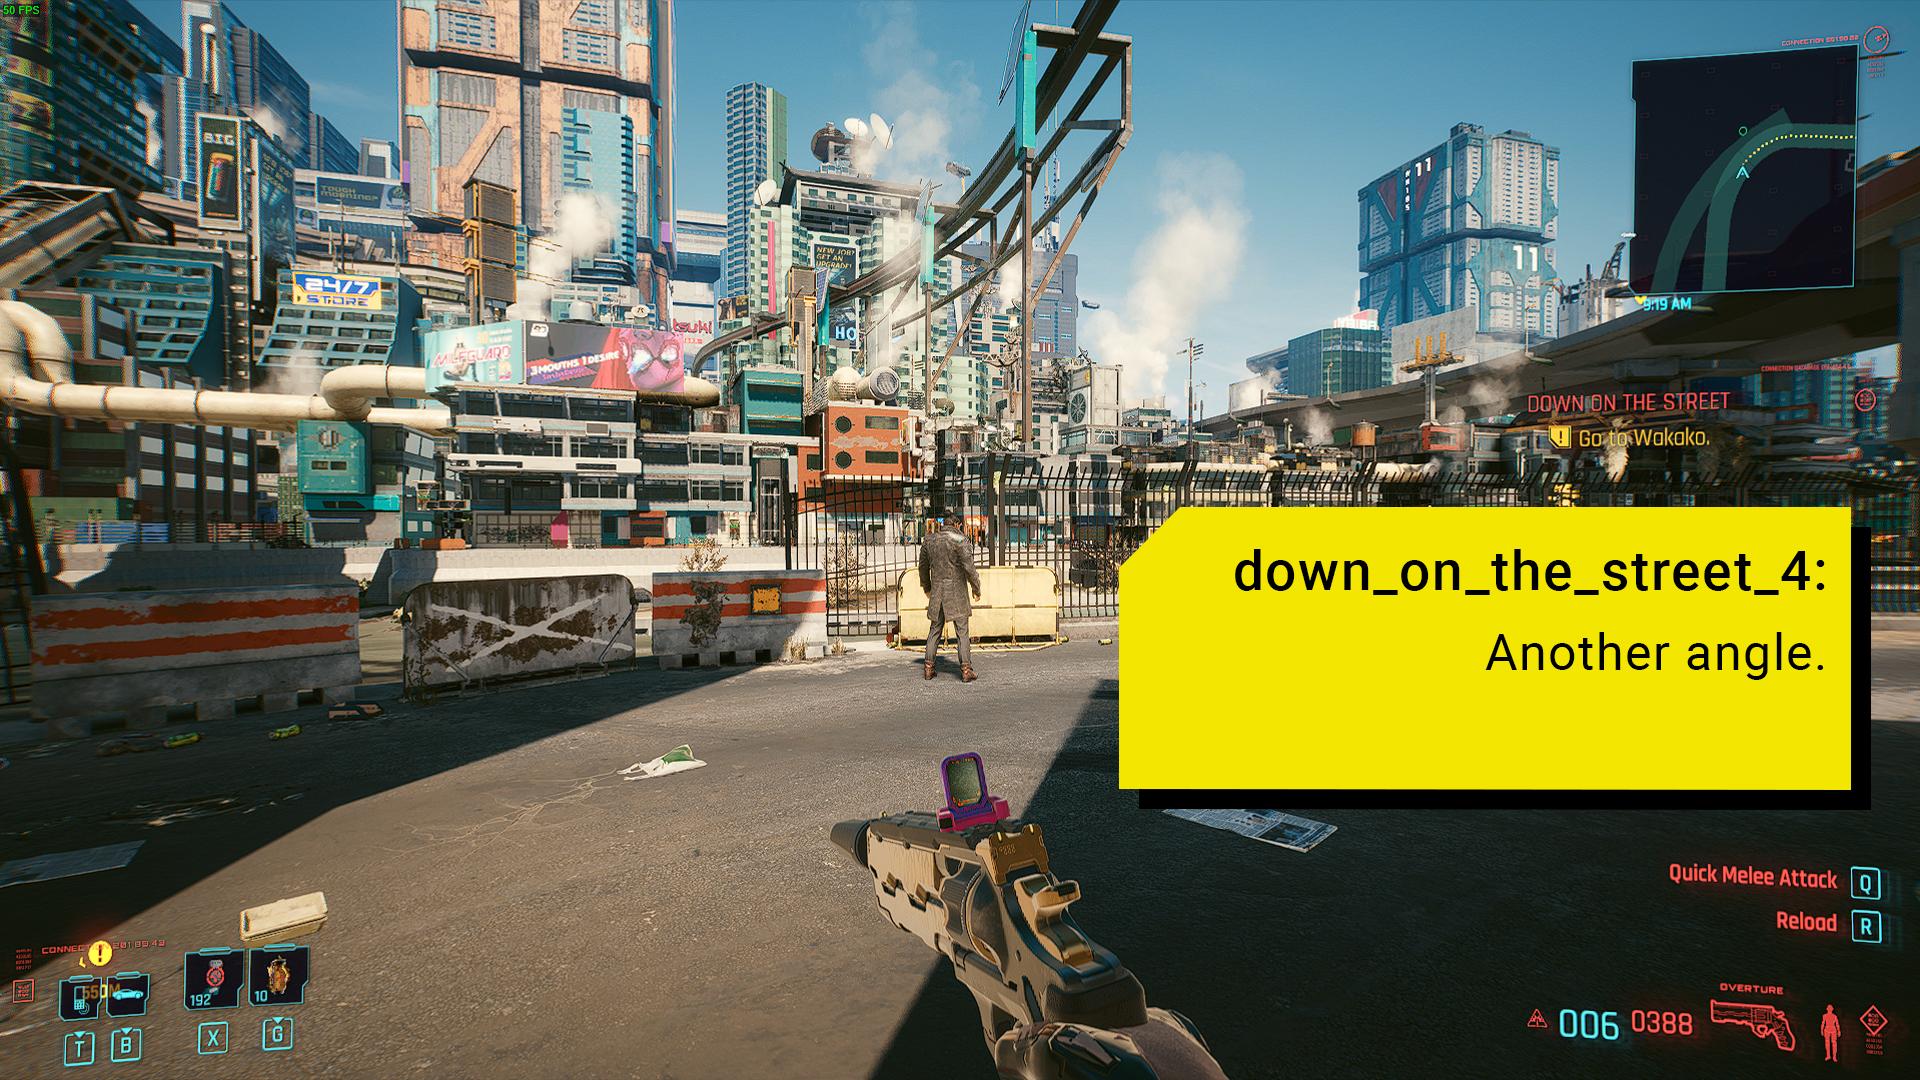 down_on_the_street_4.jpg